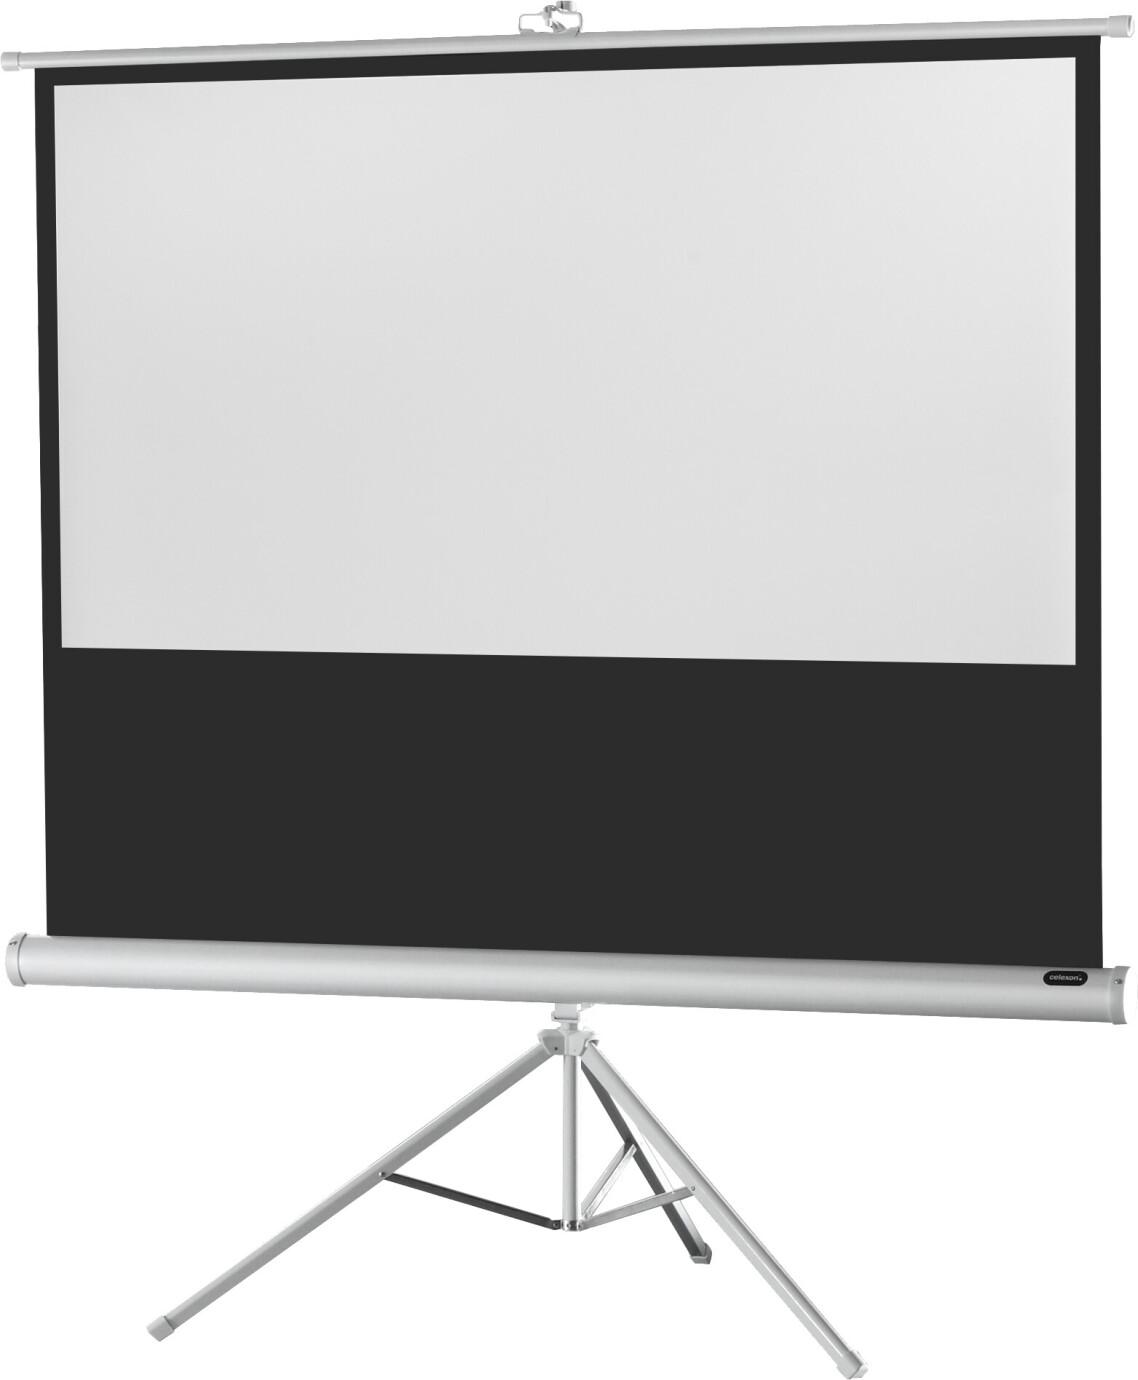 Celexon - Economy - 133cm x 75cm - 16:9 - White - Tripod Projector Screen